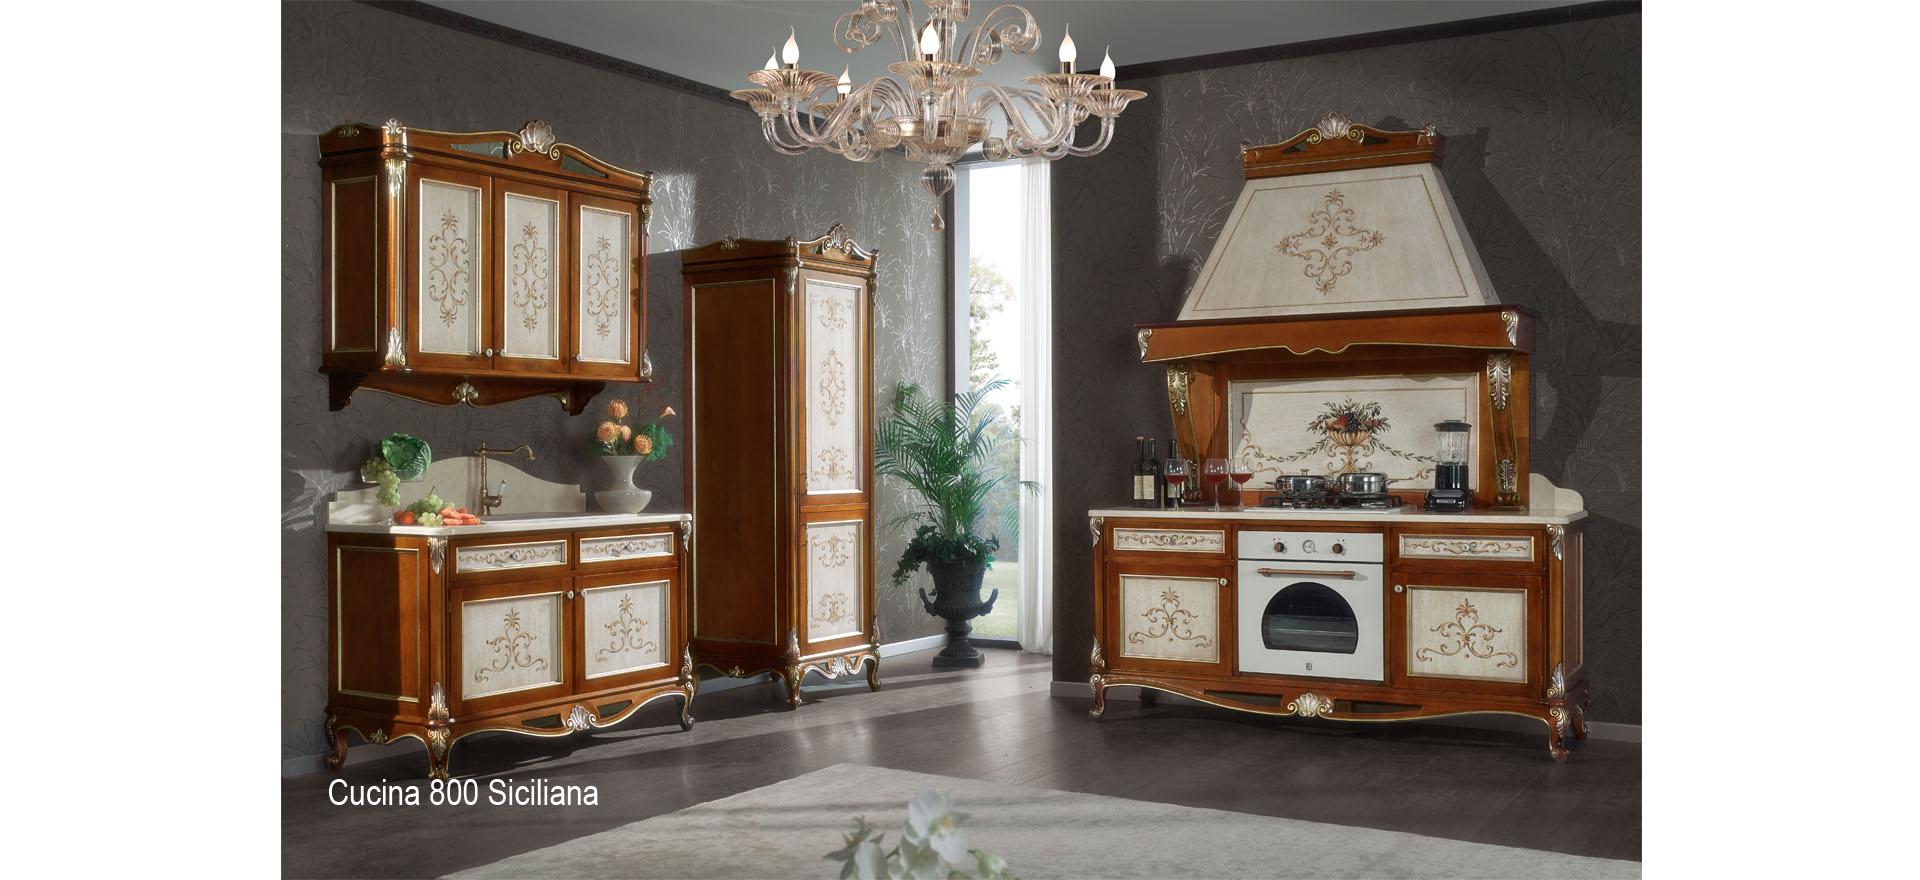 cucina 800′ Siciliana-art-